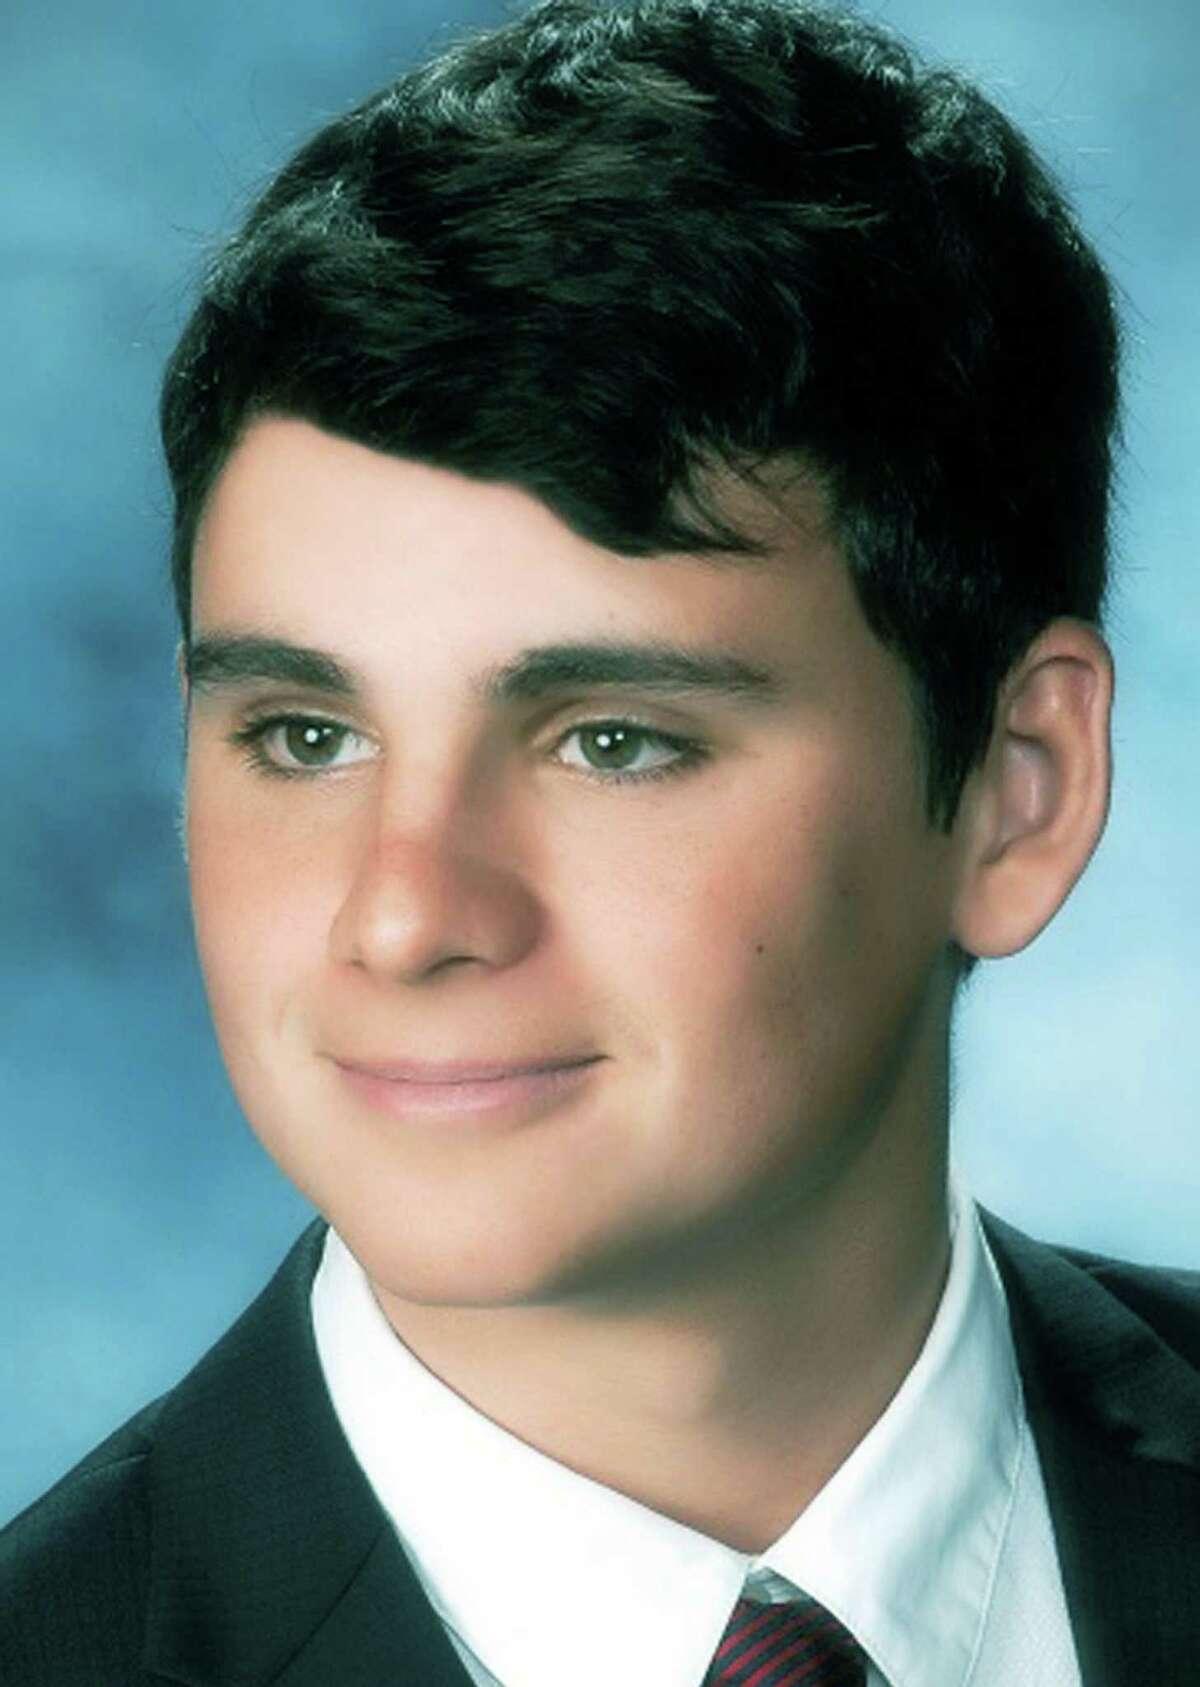 Nevan Swanson, salutatorian for the New Milford High School Class of 2014.